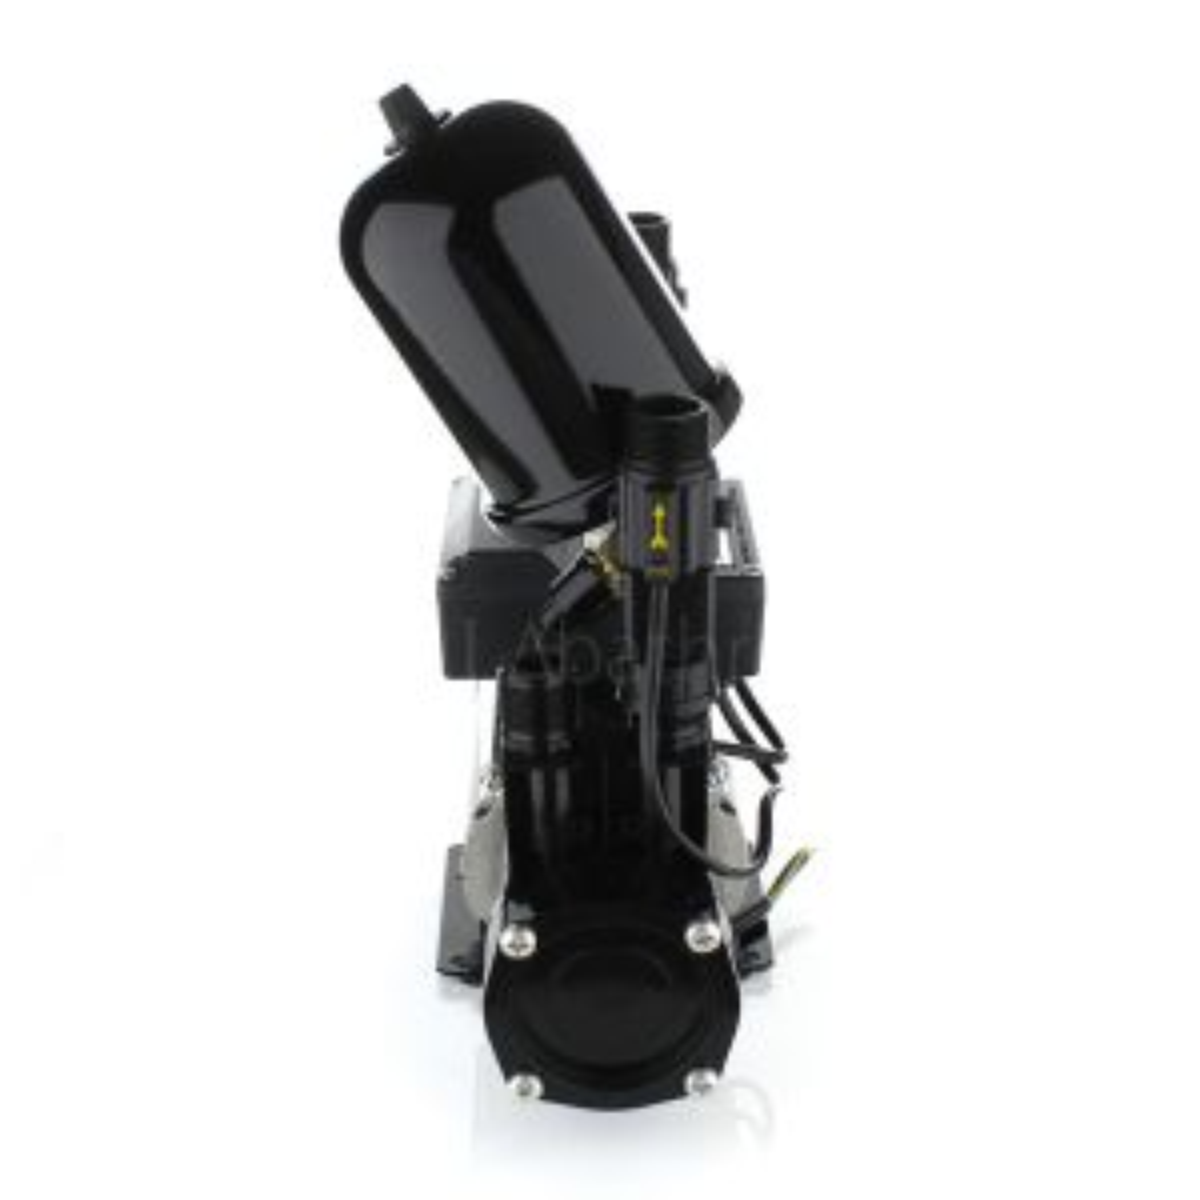 Stuart Turner 46533 Showermate Universal Twin 2.6 Bar Pump Right